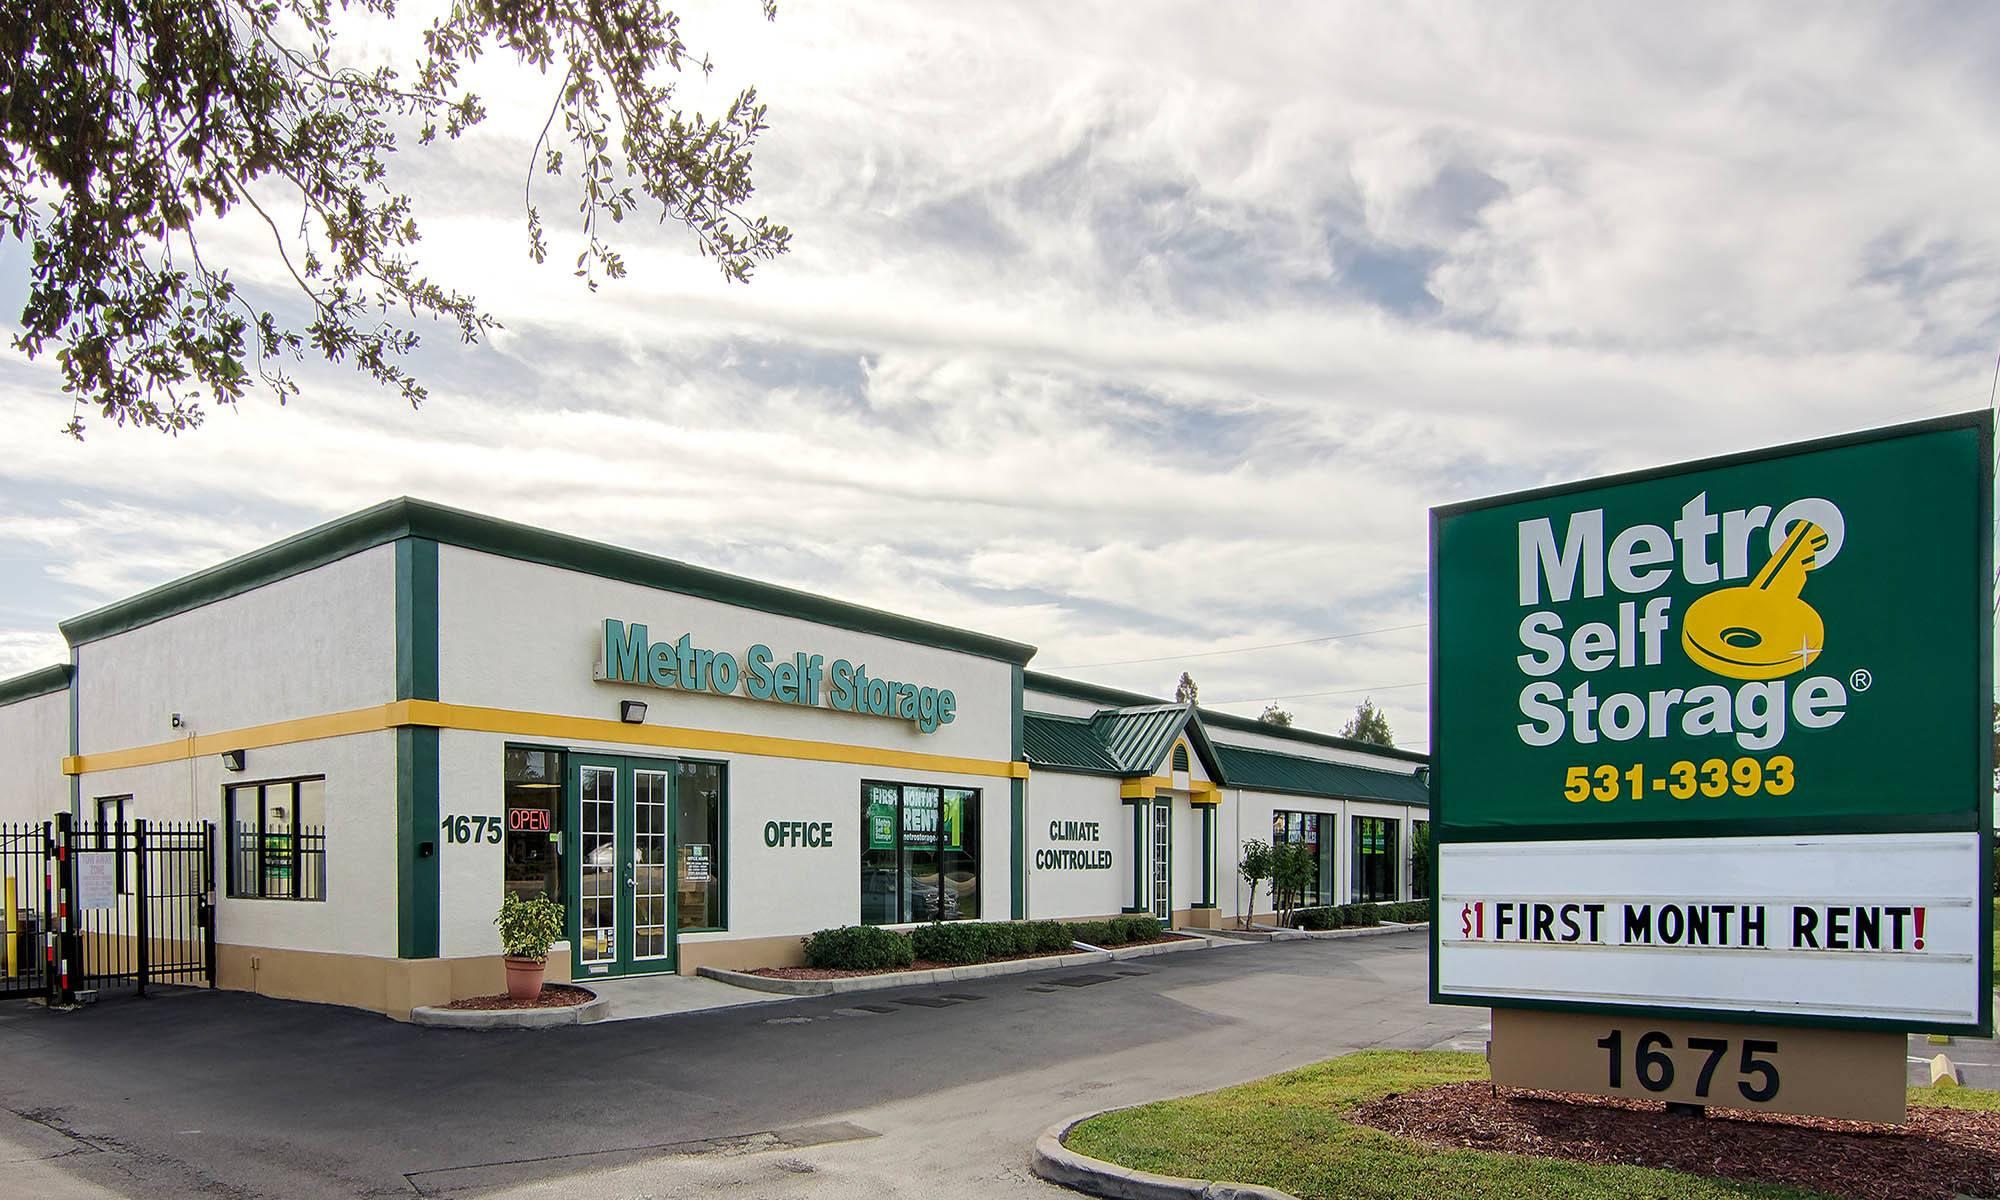 Metro Self Storage in Largo, FL